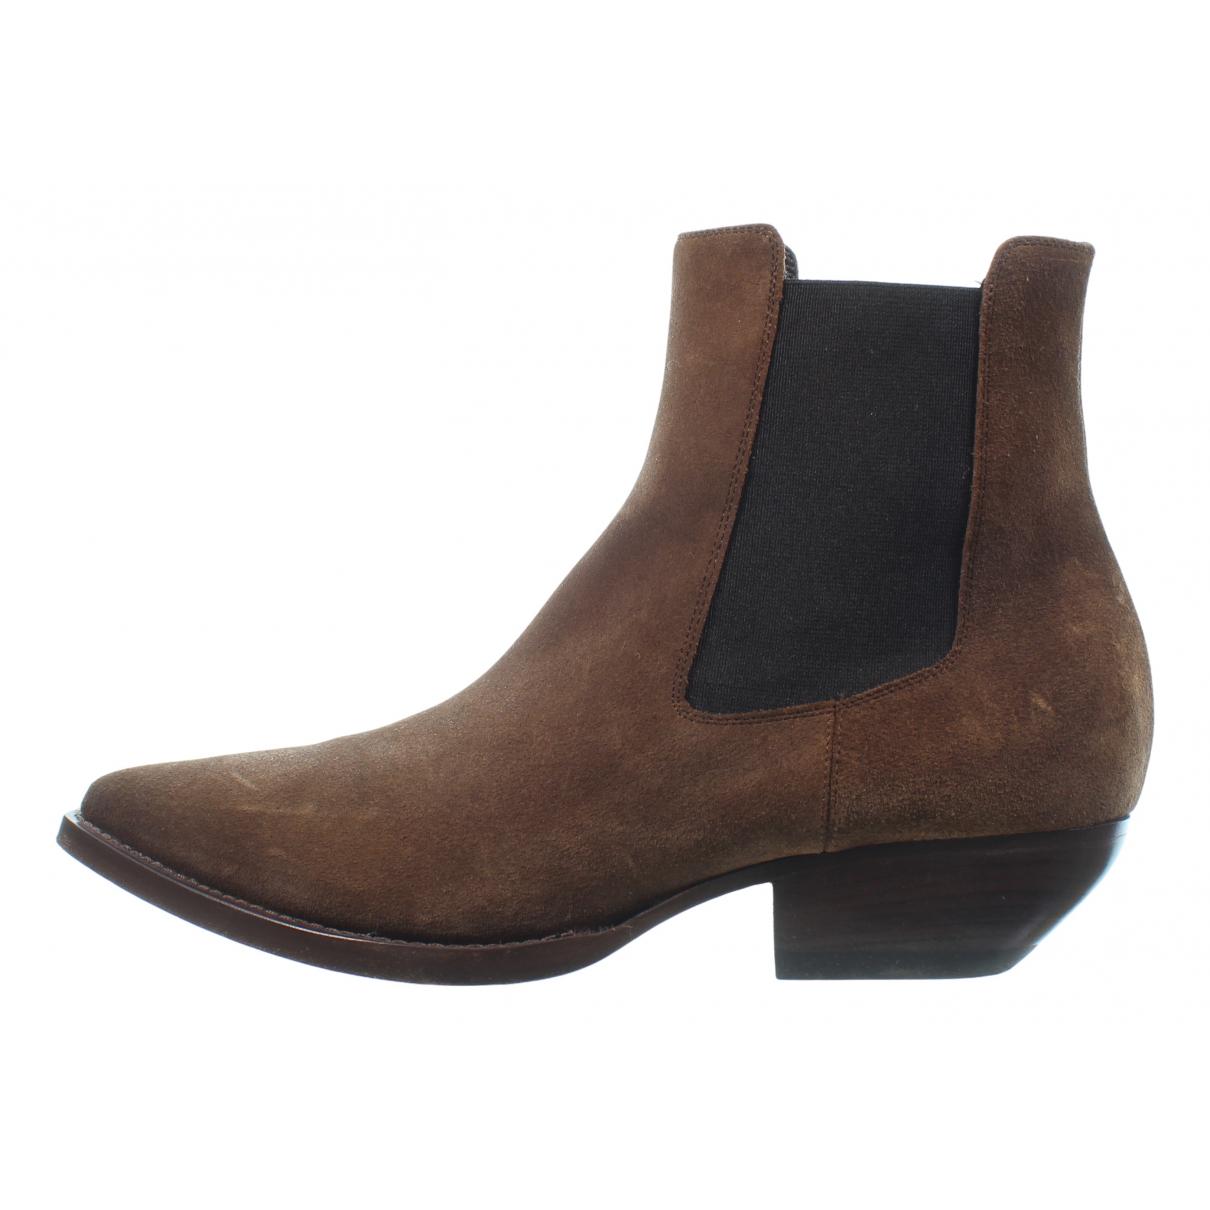 Saint Laurent \N Brown Suede Ankle boots for Women 39.5 EU